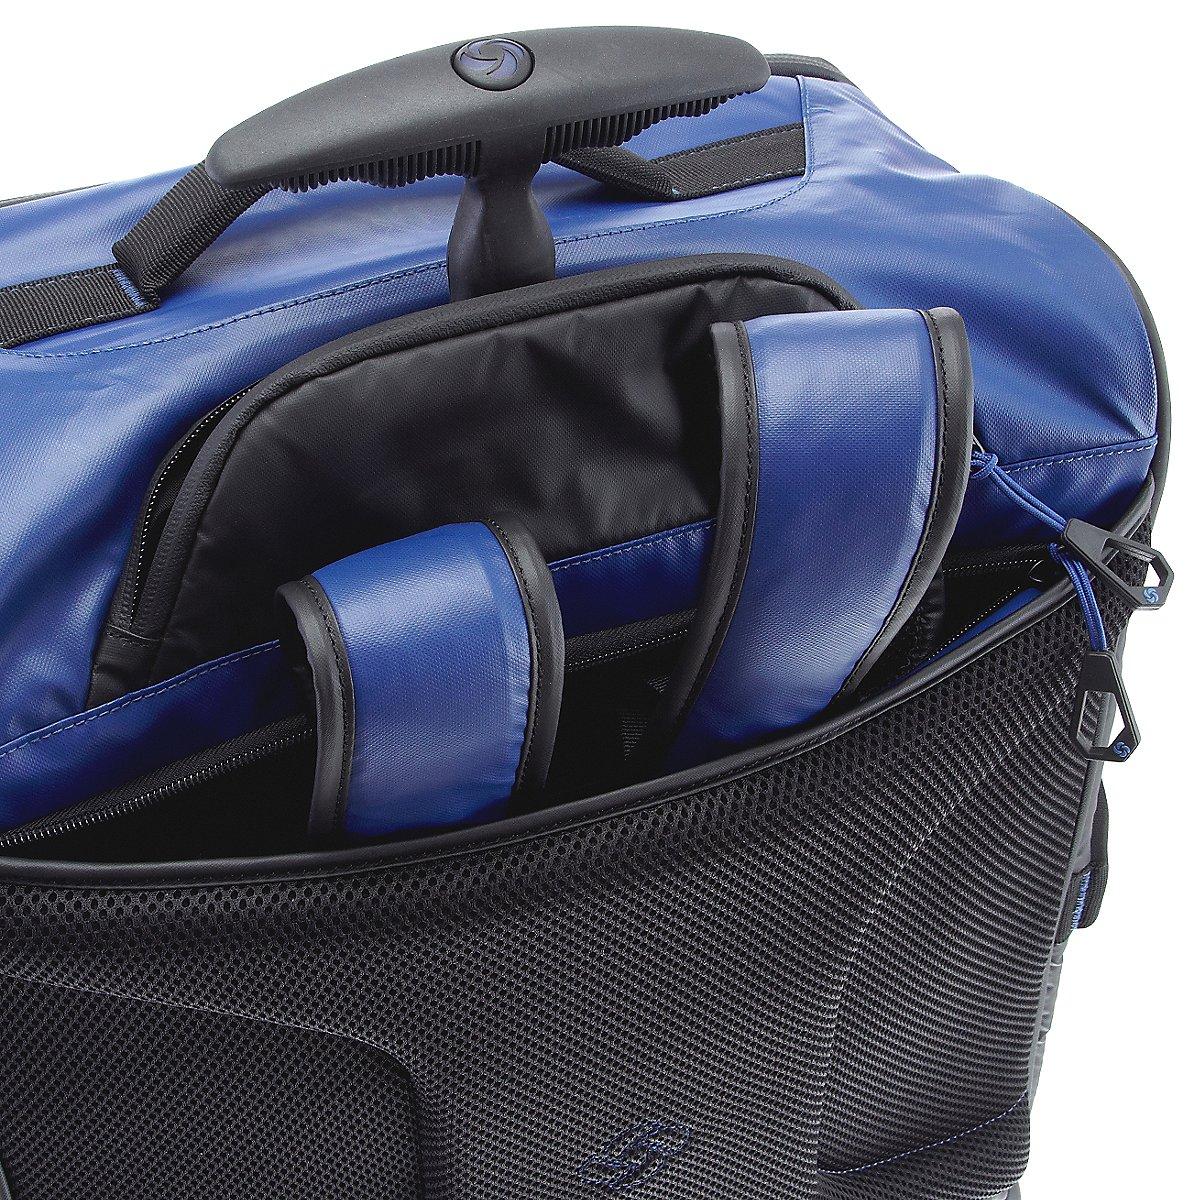 samsonite paradiver light reisetasche auf rollen 55 cm. Black Bedroom Furniture Sets. Home Design Ideas